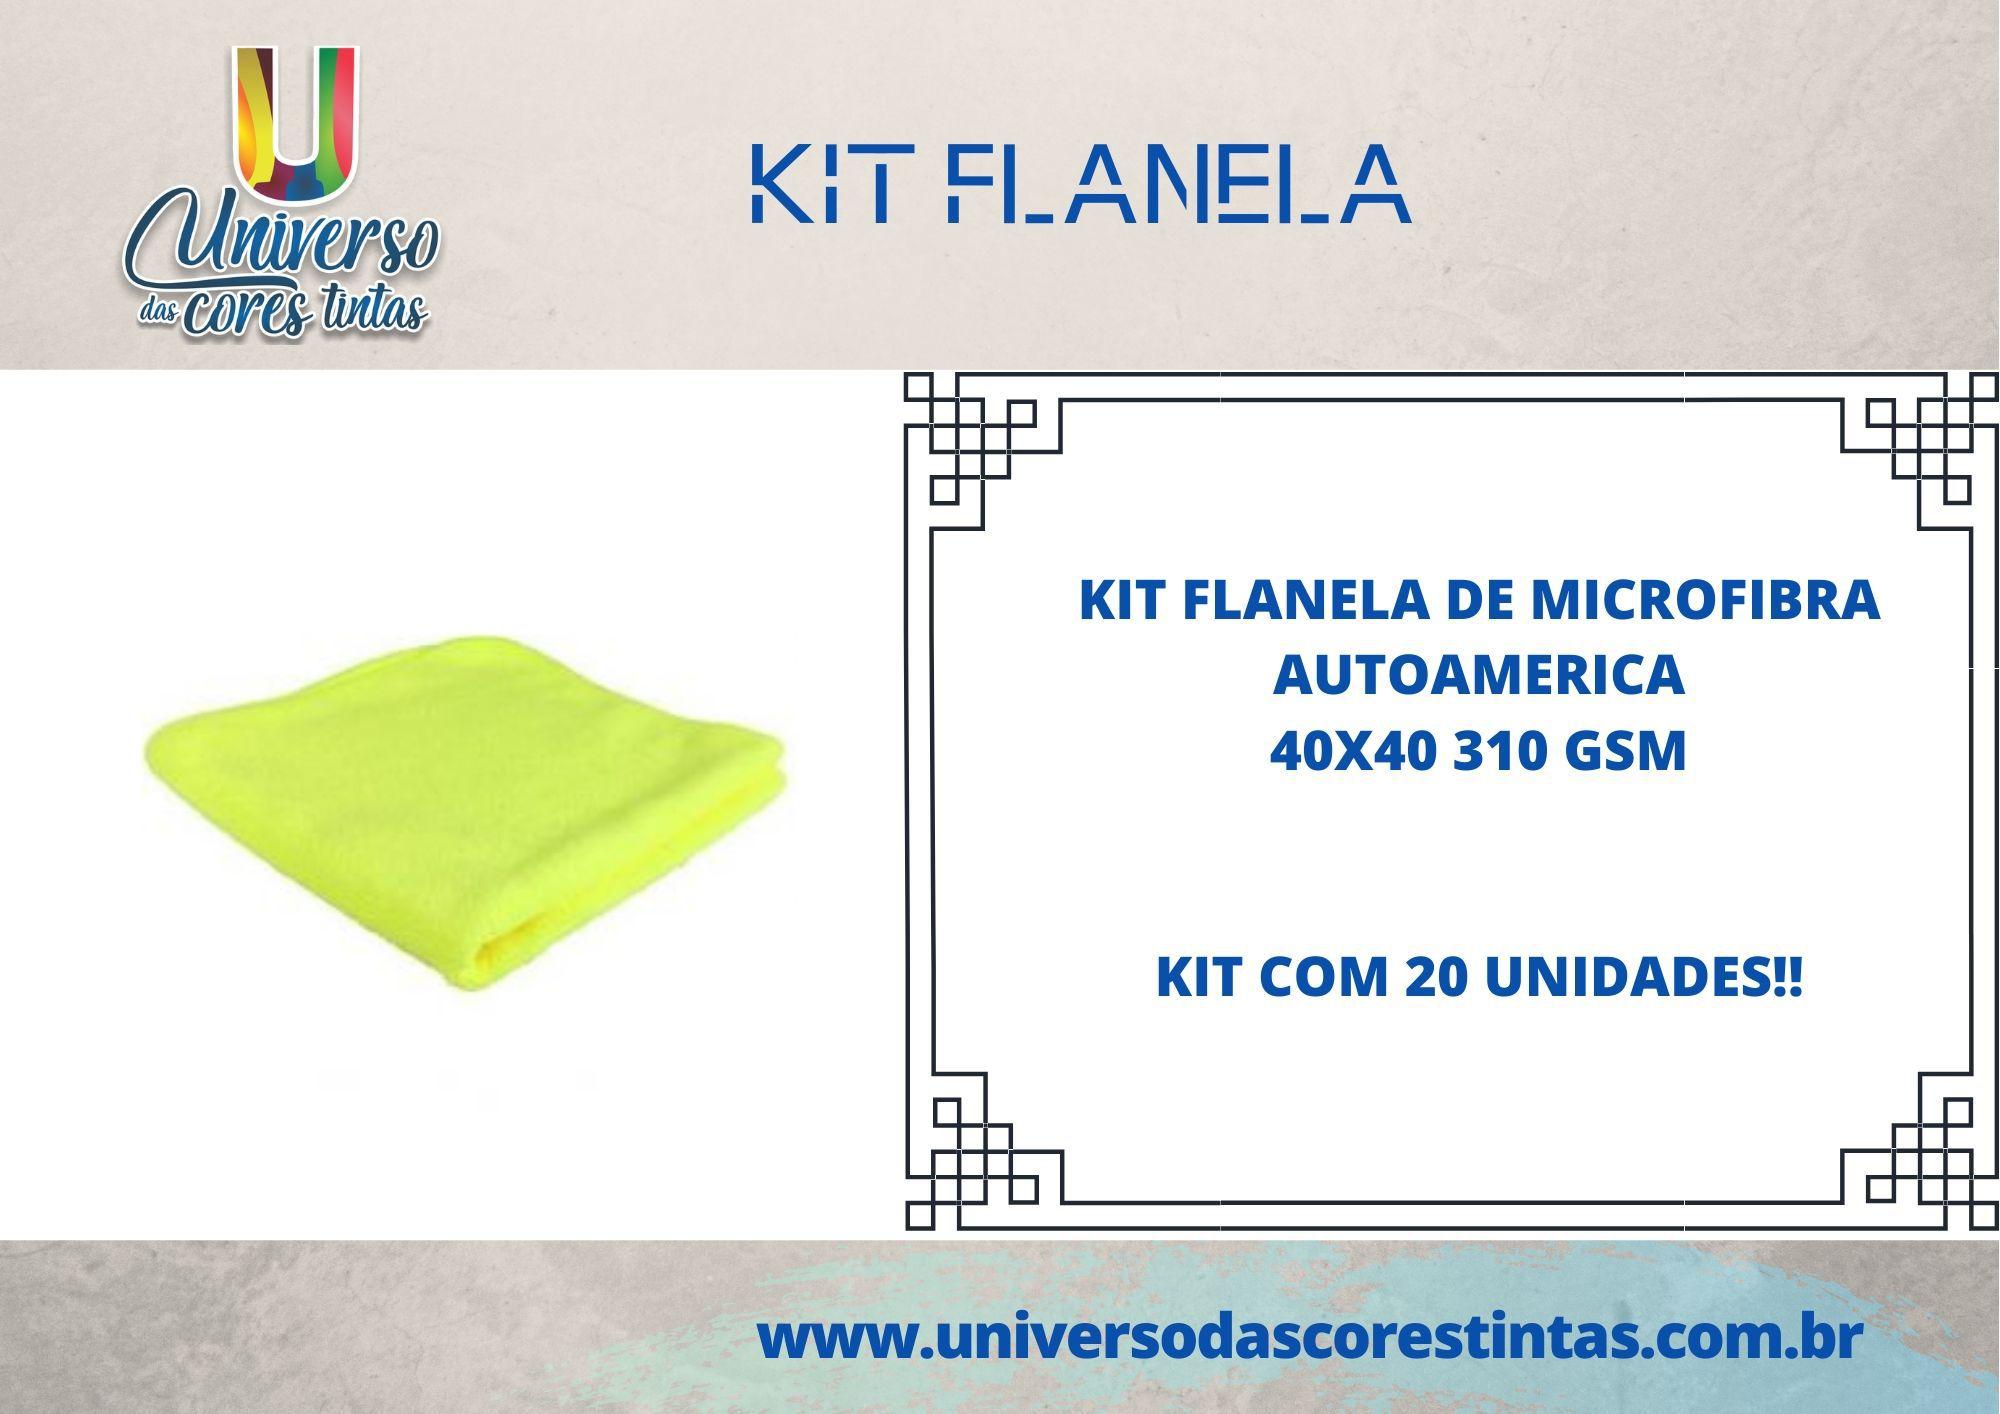 Kit de Flanela de Microfibra 40x40 310 GSM Autoamerica (20 Unidades)